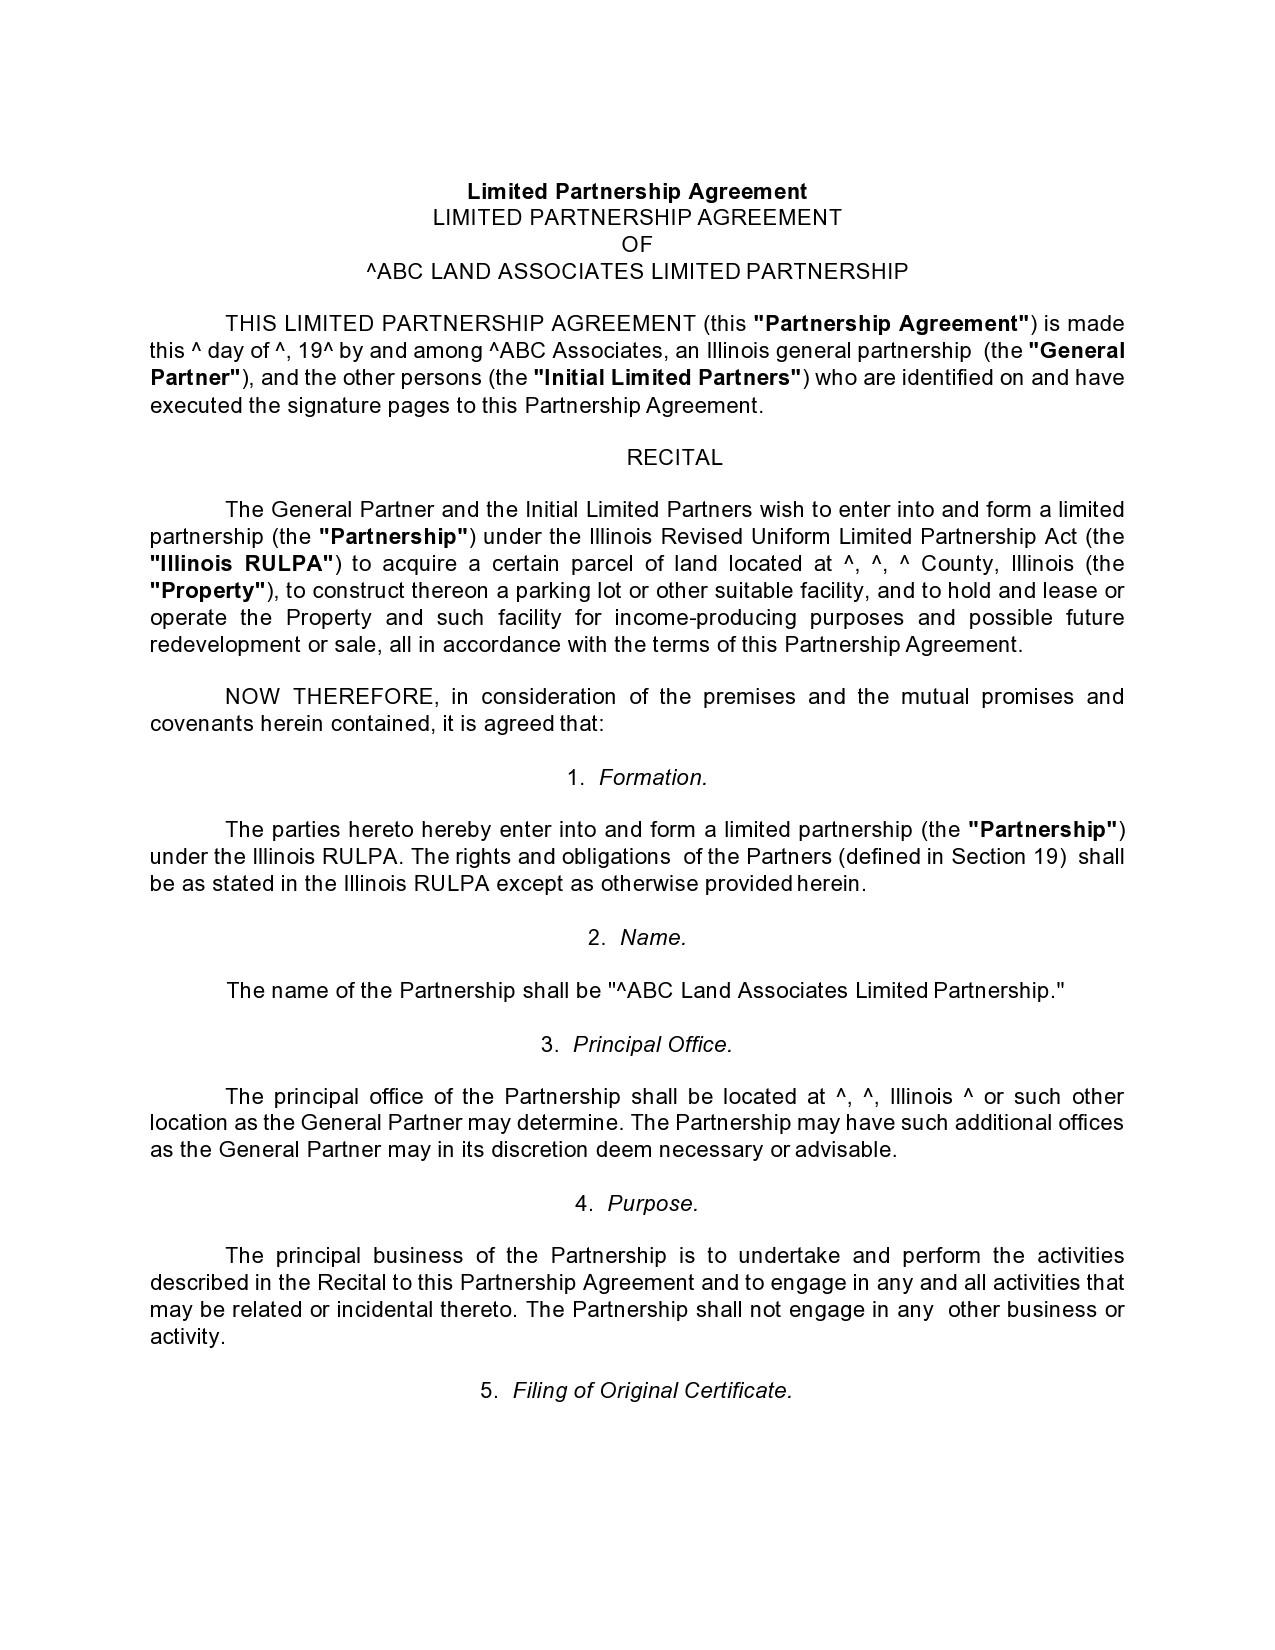 Free limited partnership agreement 37